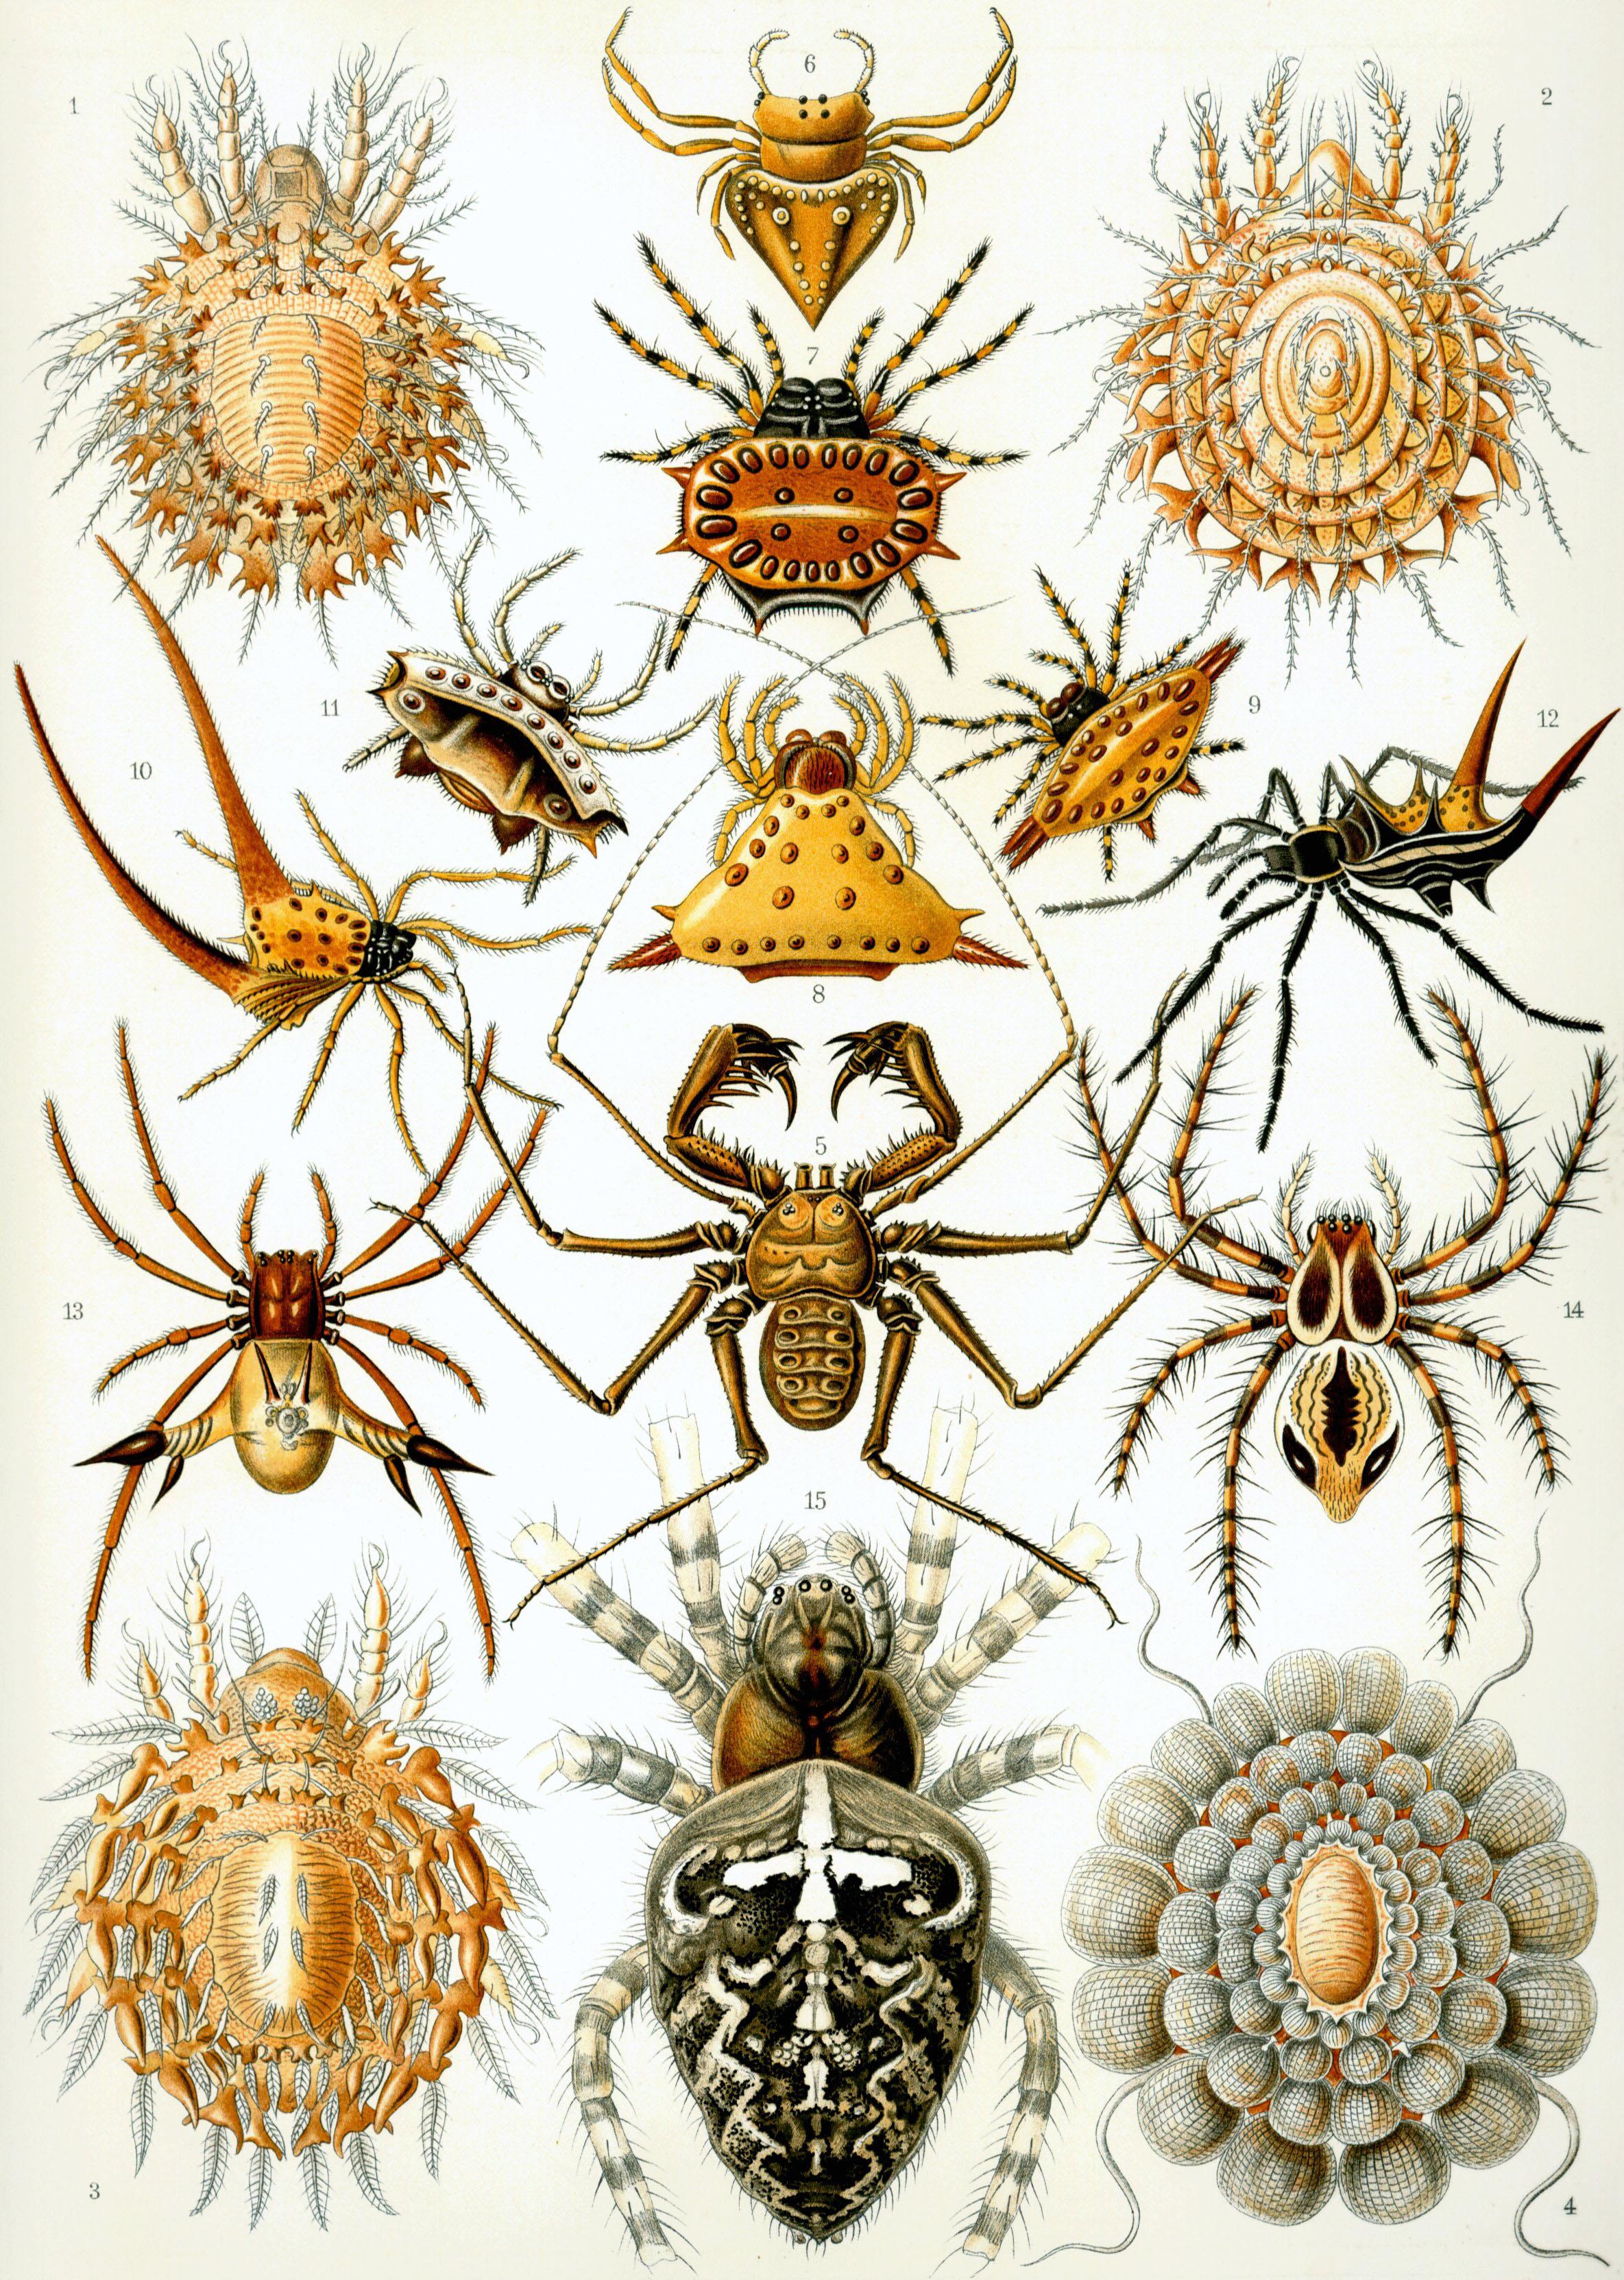 Arachnid.